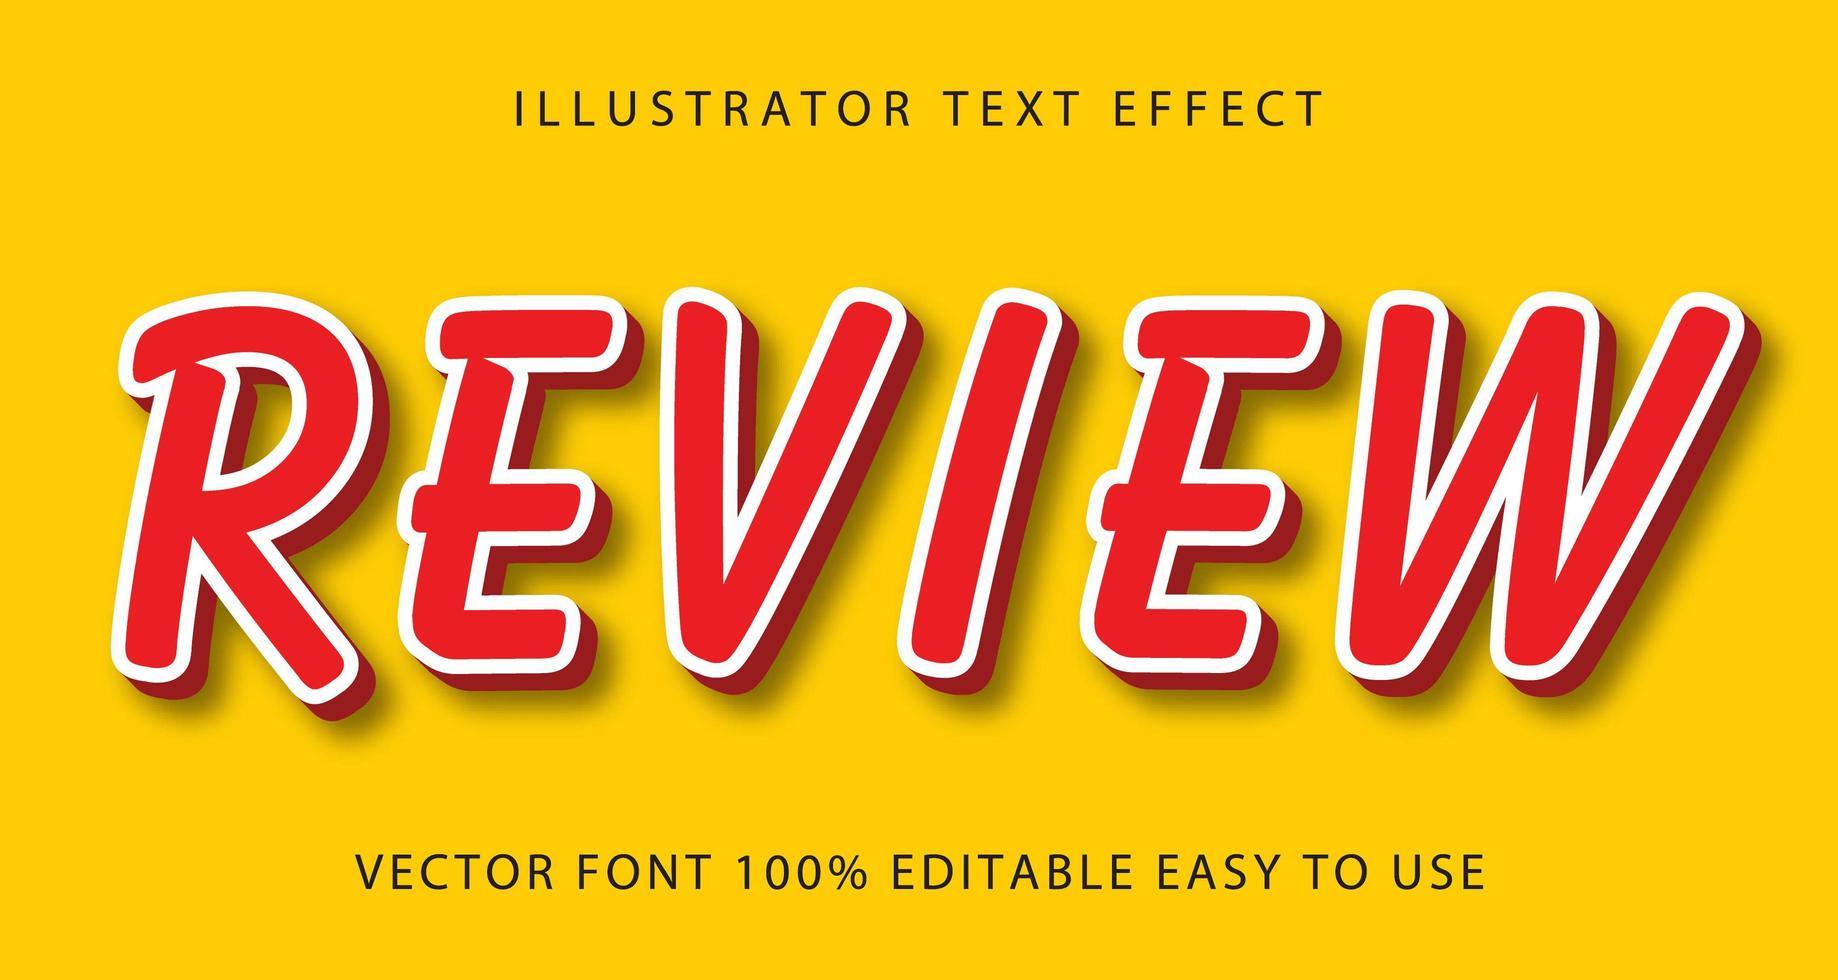 rode, witte lijn dunne review tekst effect vector